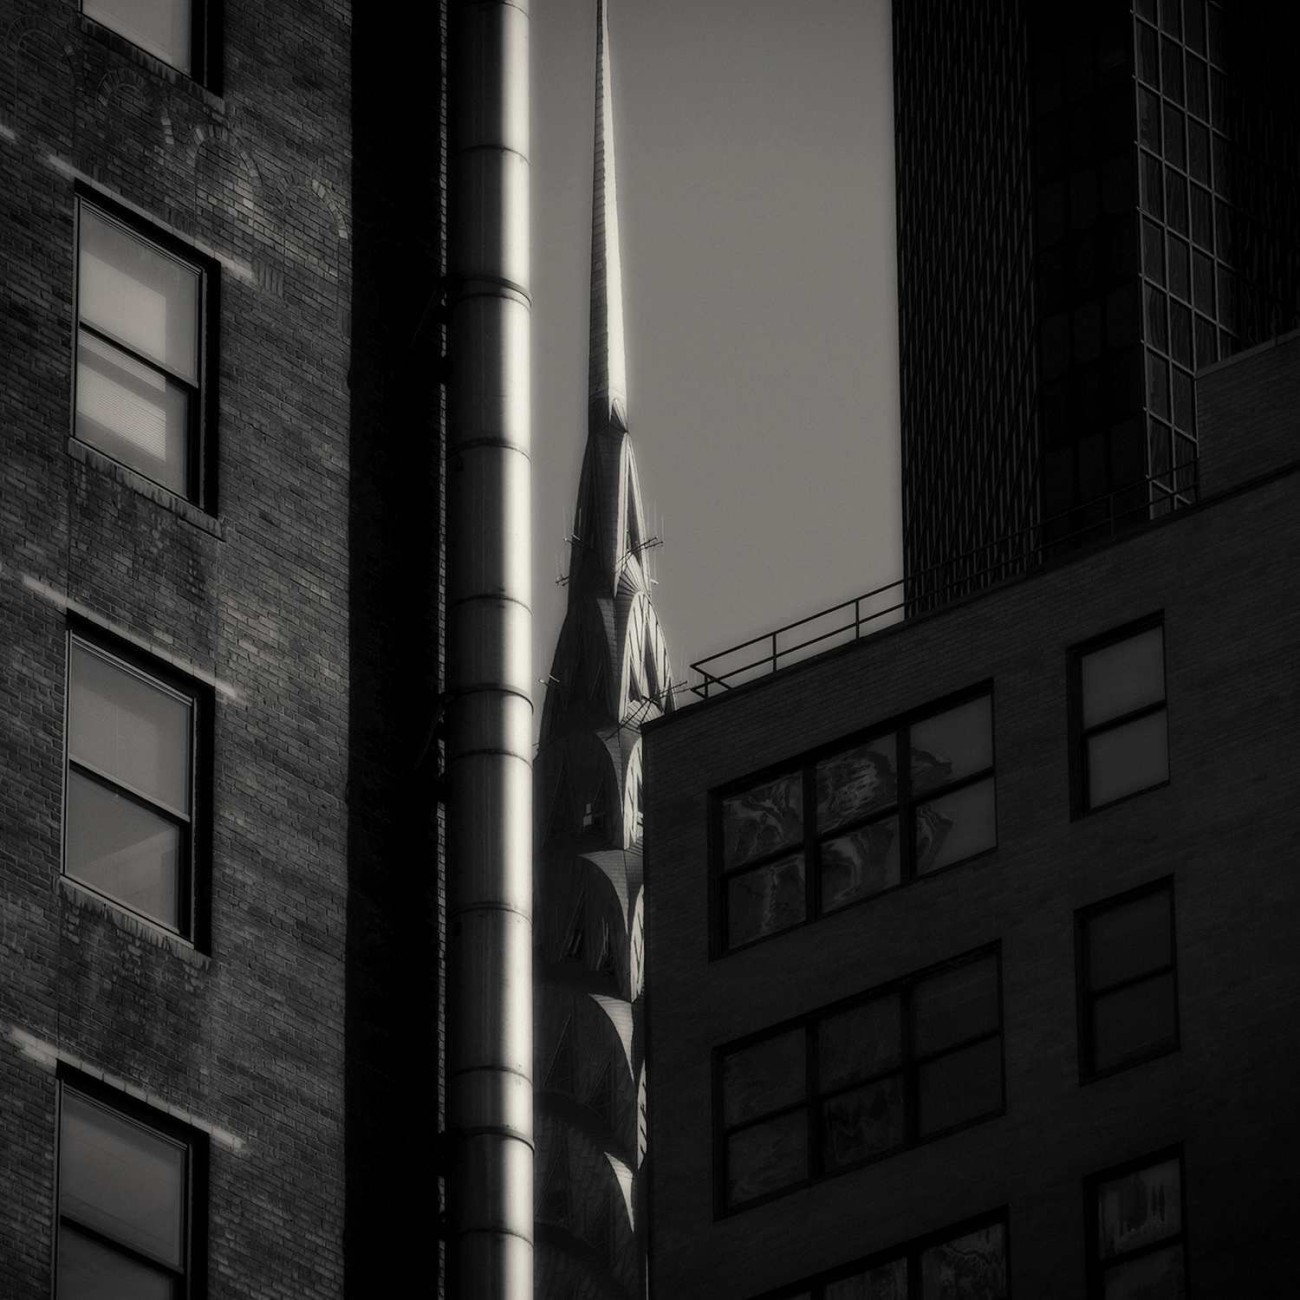 Chrysler Building steeple, New York, 2010